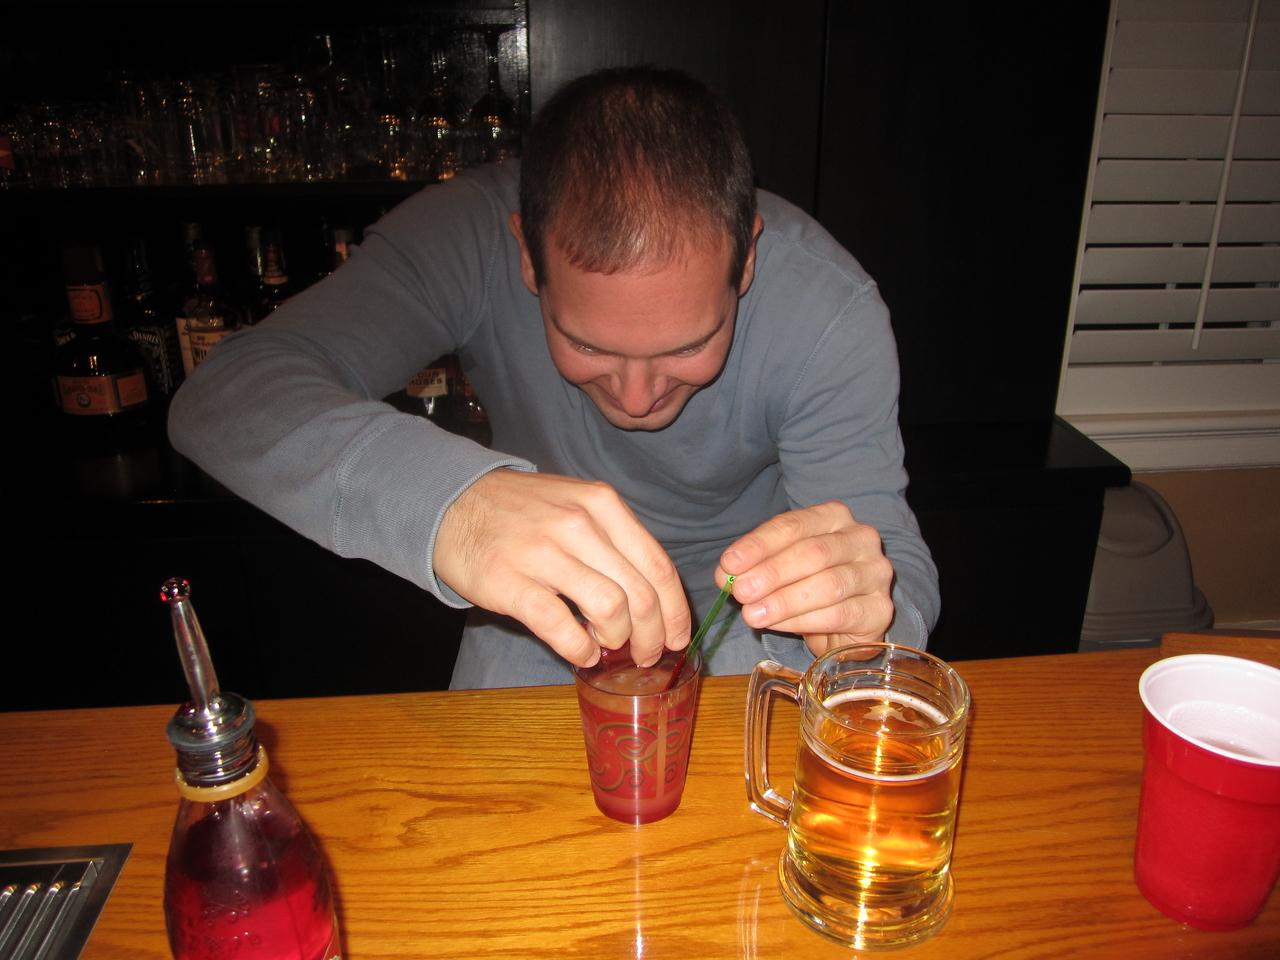 Jon making a tequila sunrise